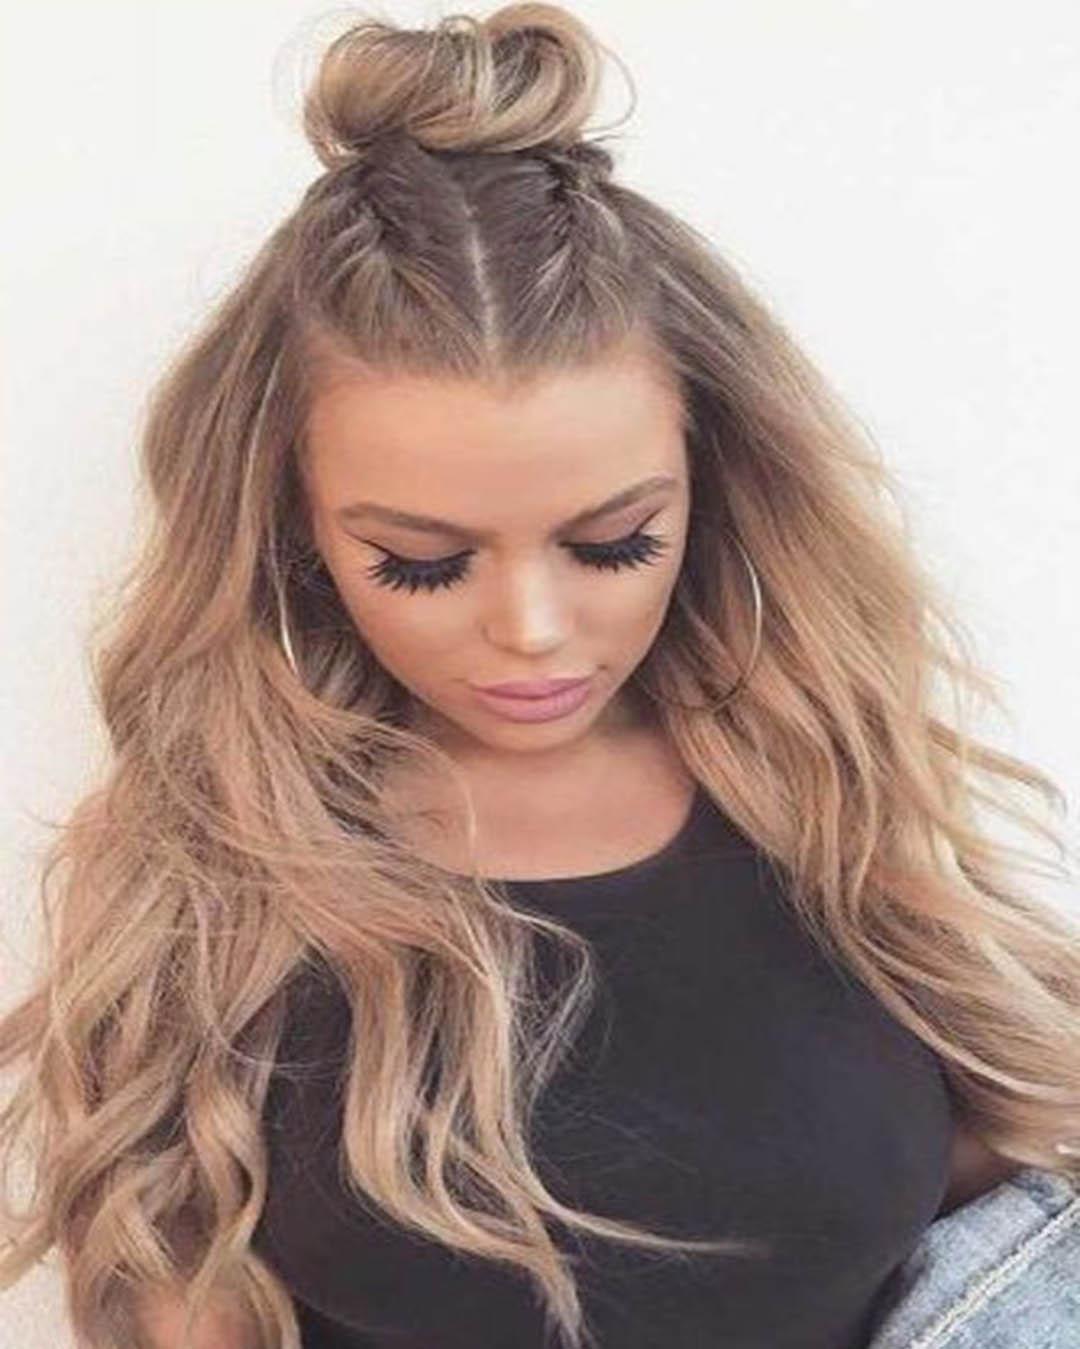 Trendy hairstyles for teenage girls - Girlcheck